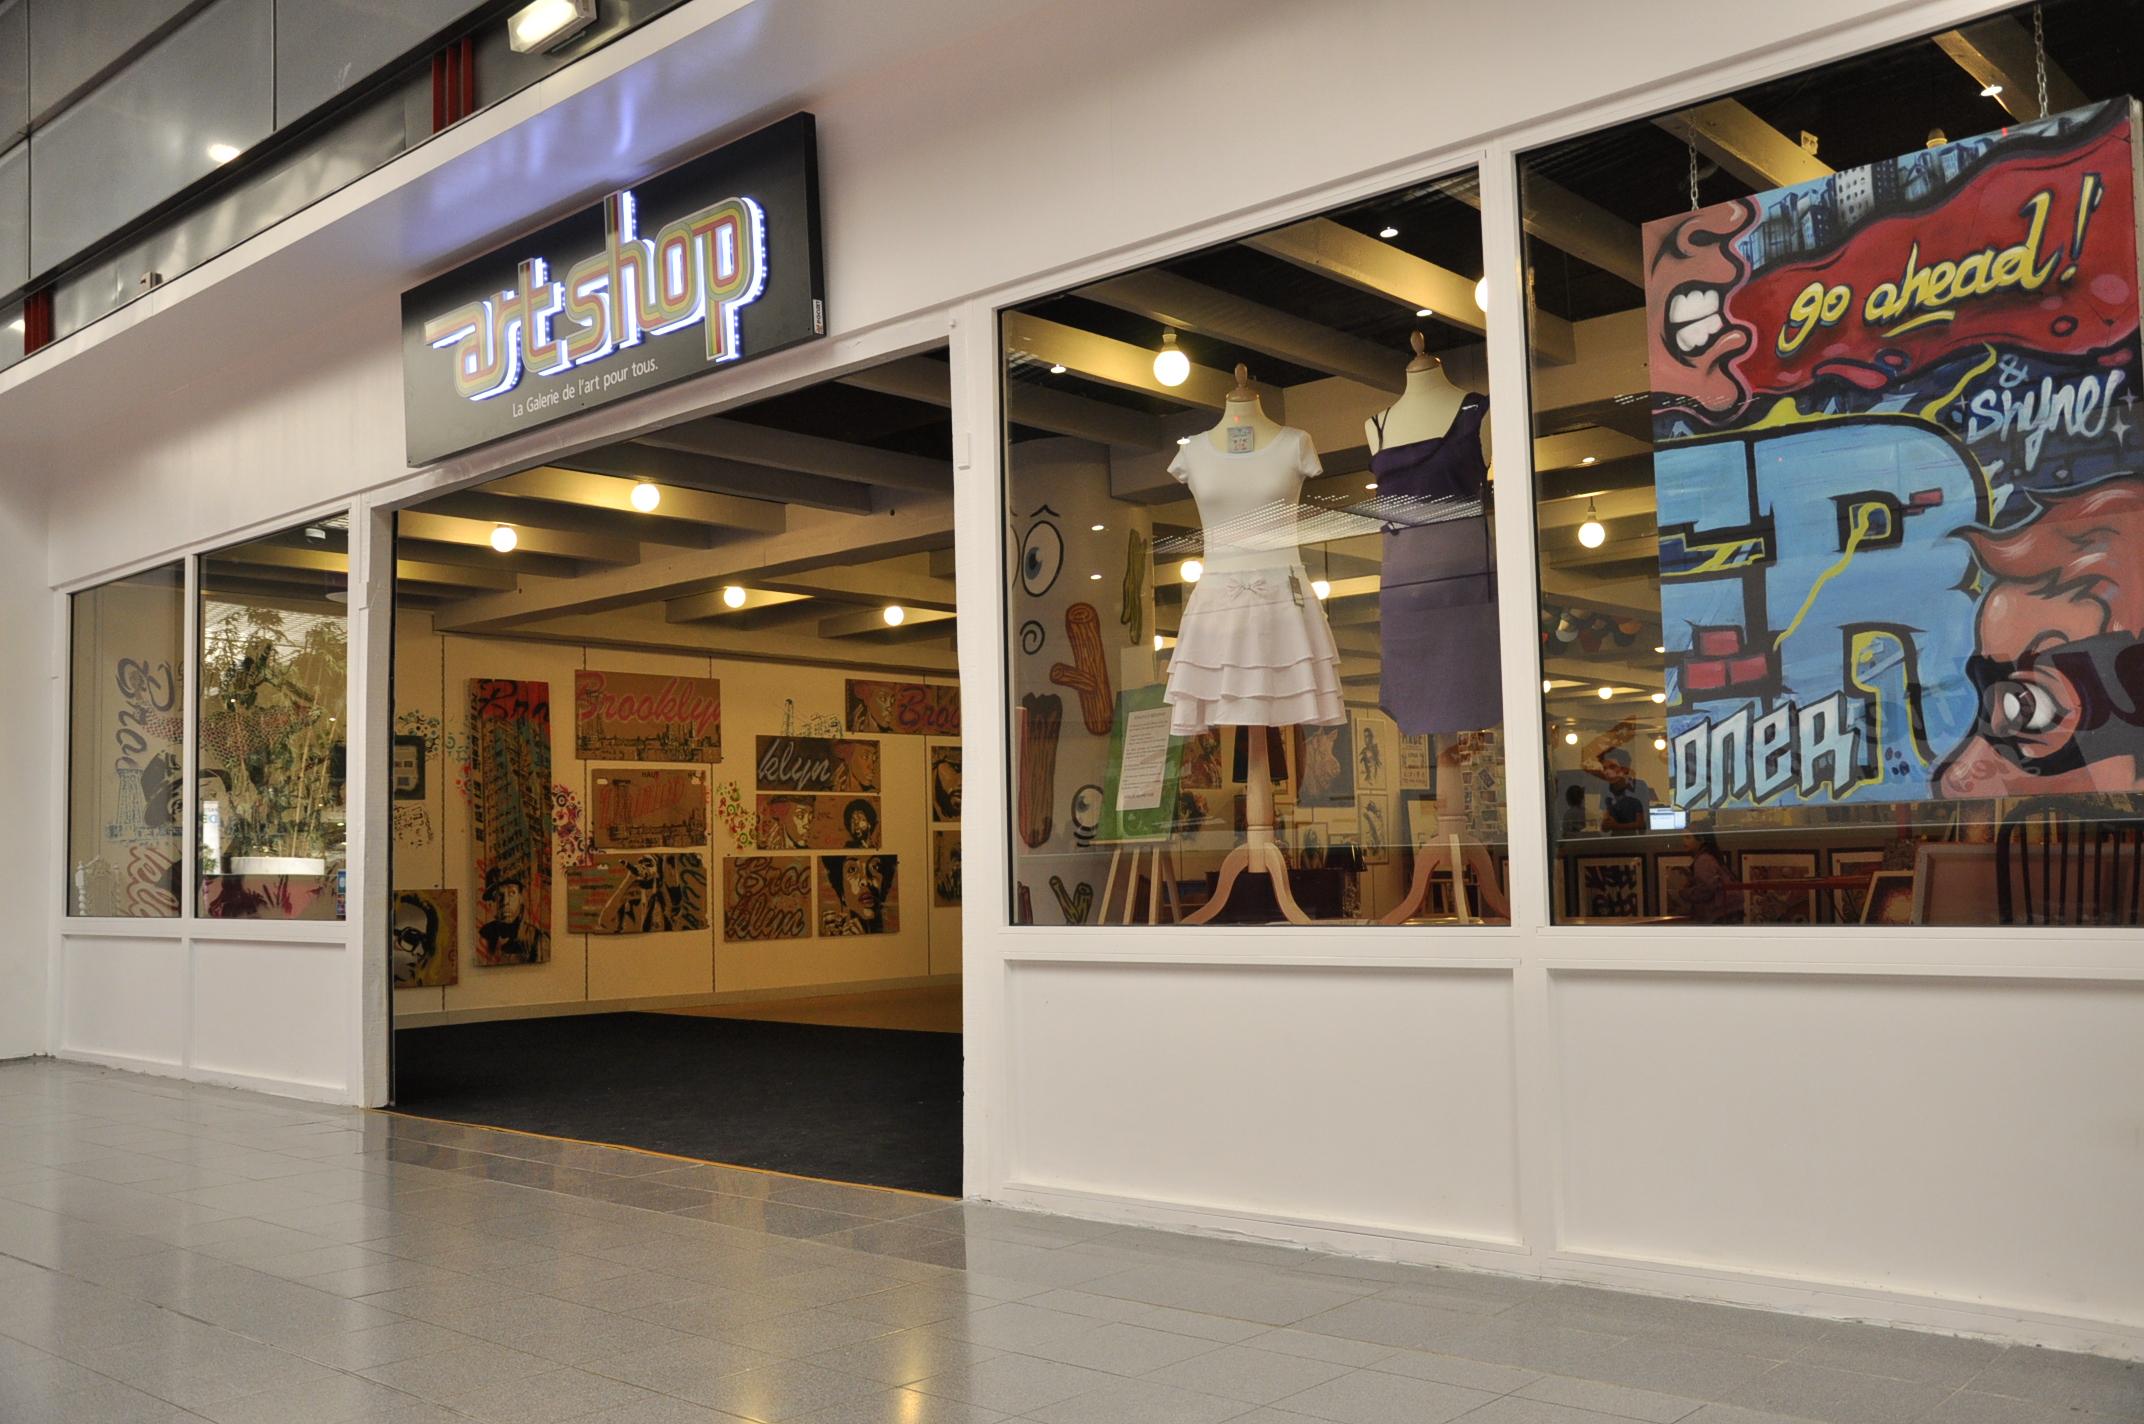 artshopconcept galerie d 39 art concept store lille. Black Bedroom Furniture Sets. Home Design Ideas